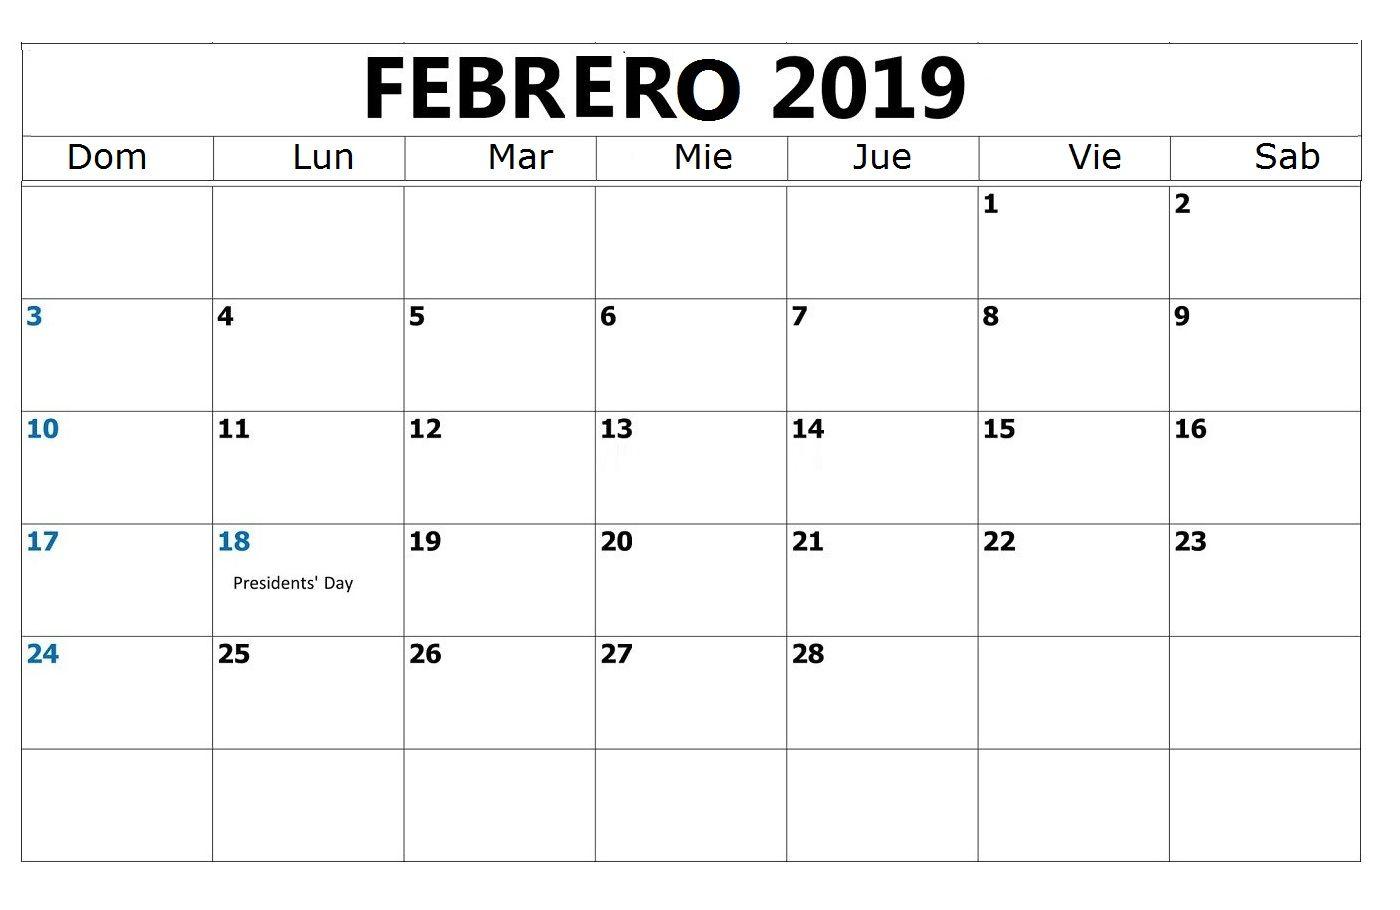 Calendario Febrero 2019 Usa February 2019 Calendario Febrero 2019 Para Imprimir Gratis #febrero #febrero2019